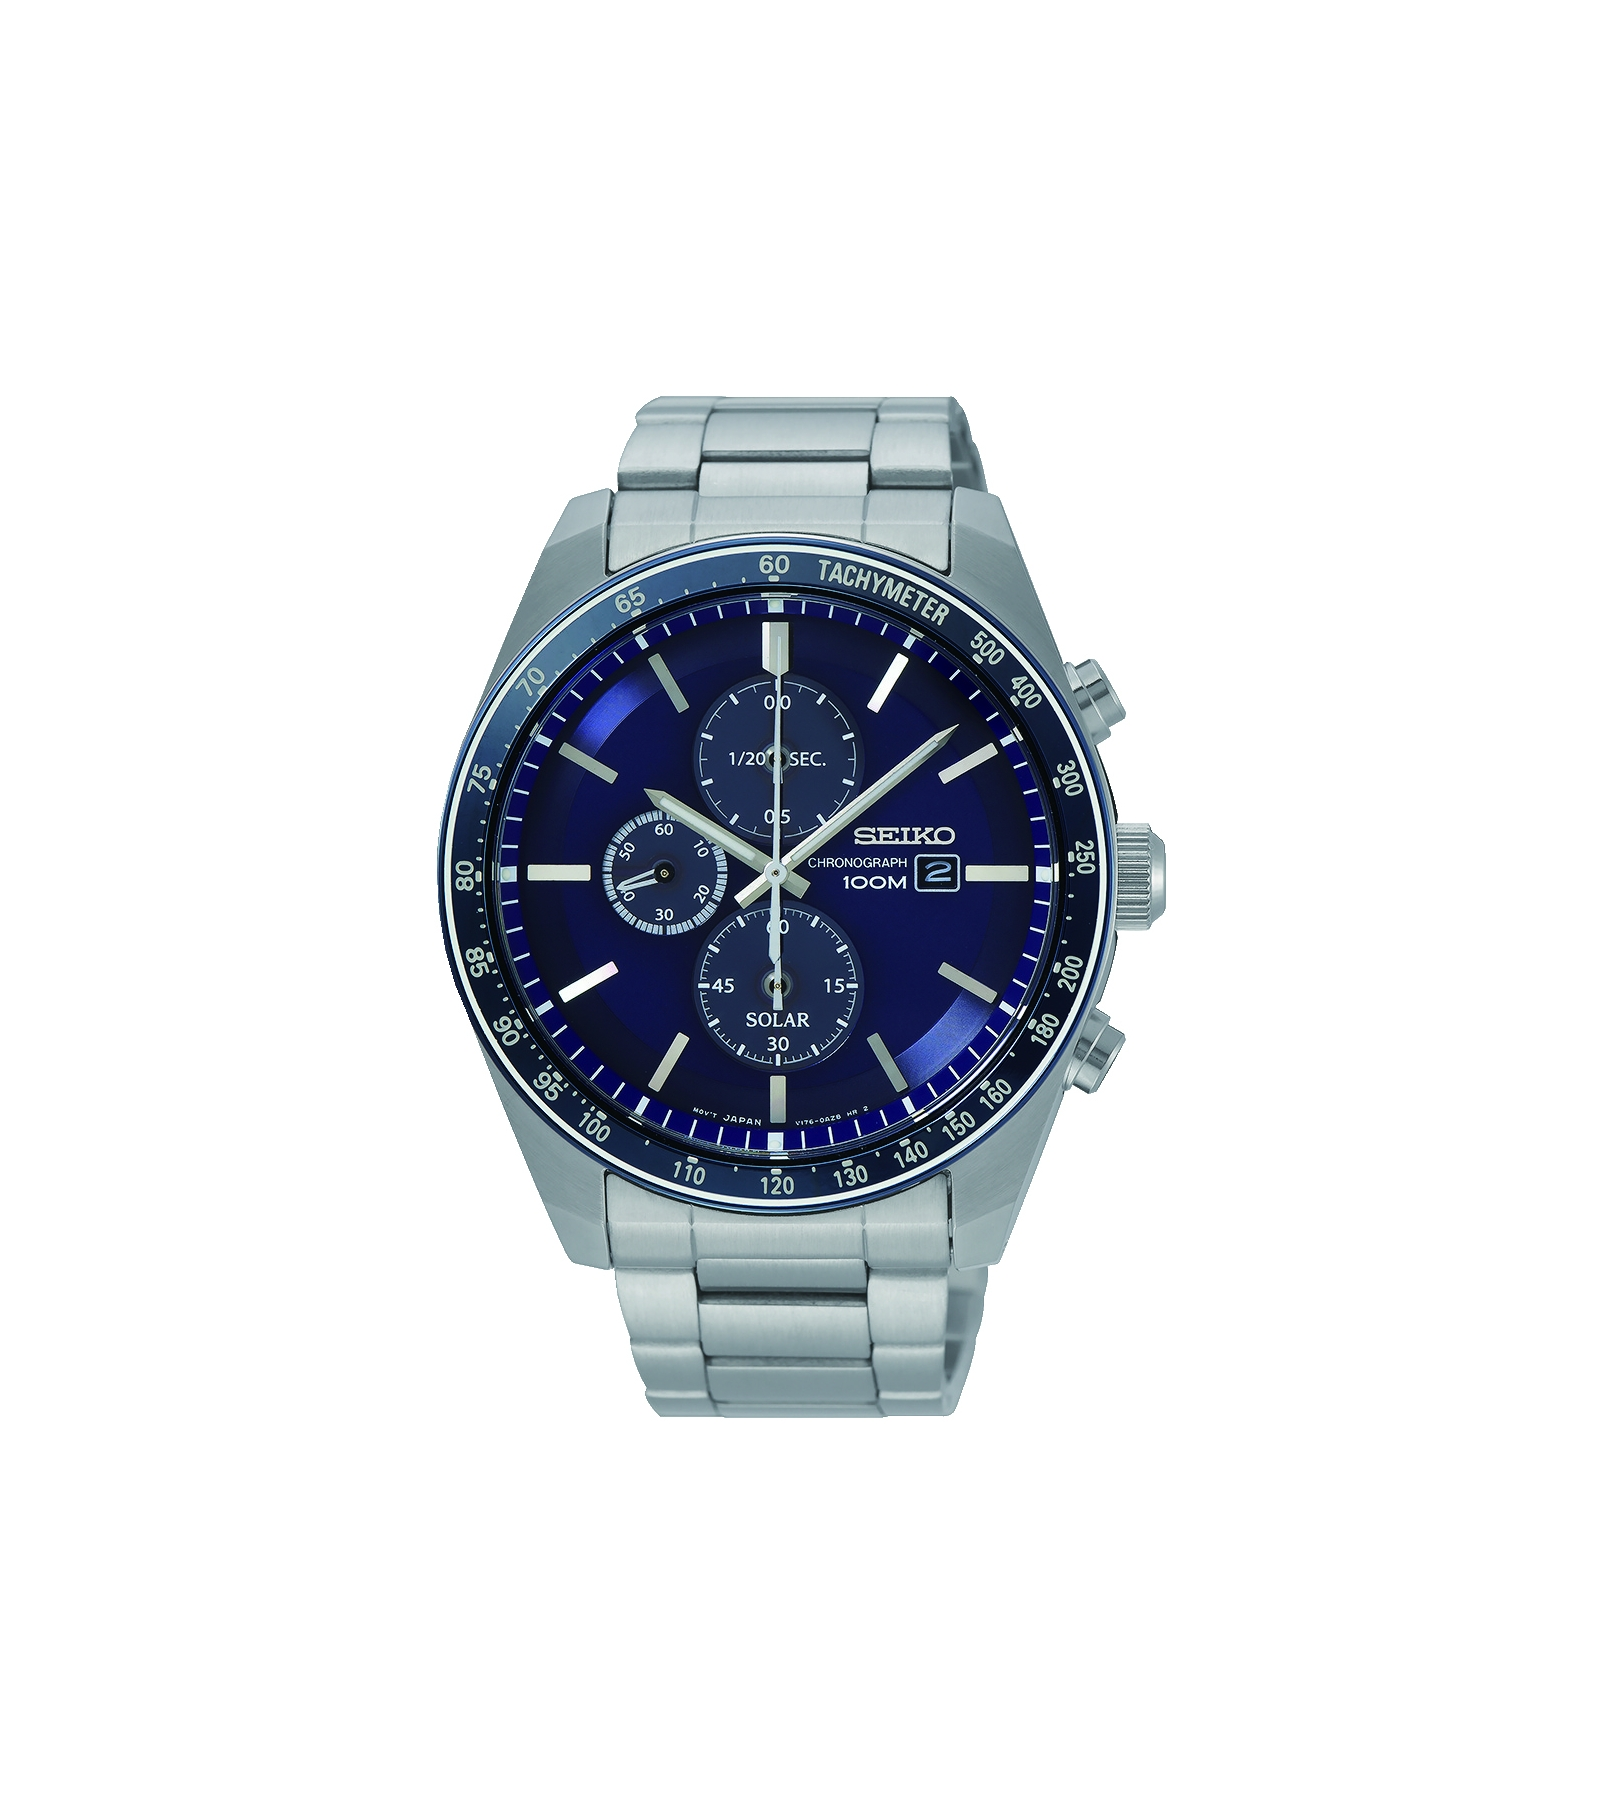 Seiko Kronograf Ssc719p Erkek Kol Saati I Turkiye Distributoru Garantisiyle Edip Saat Galerisinde